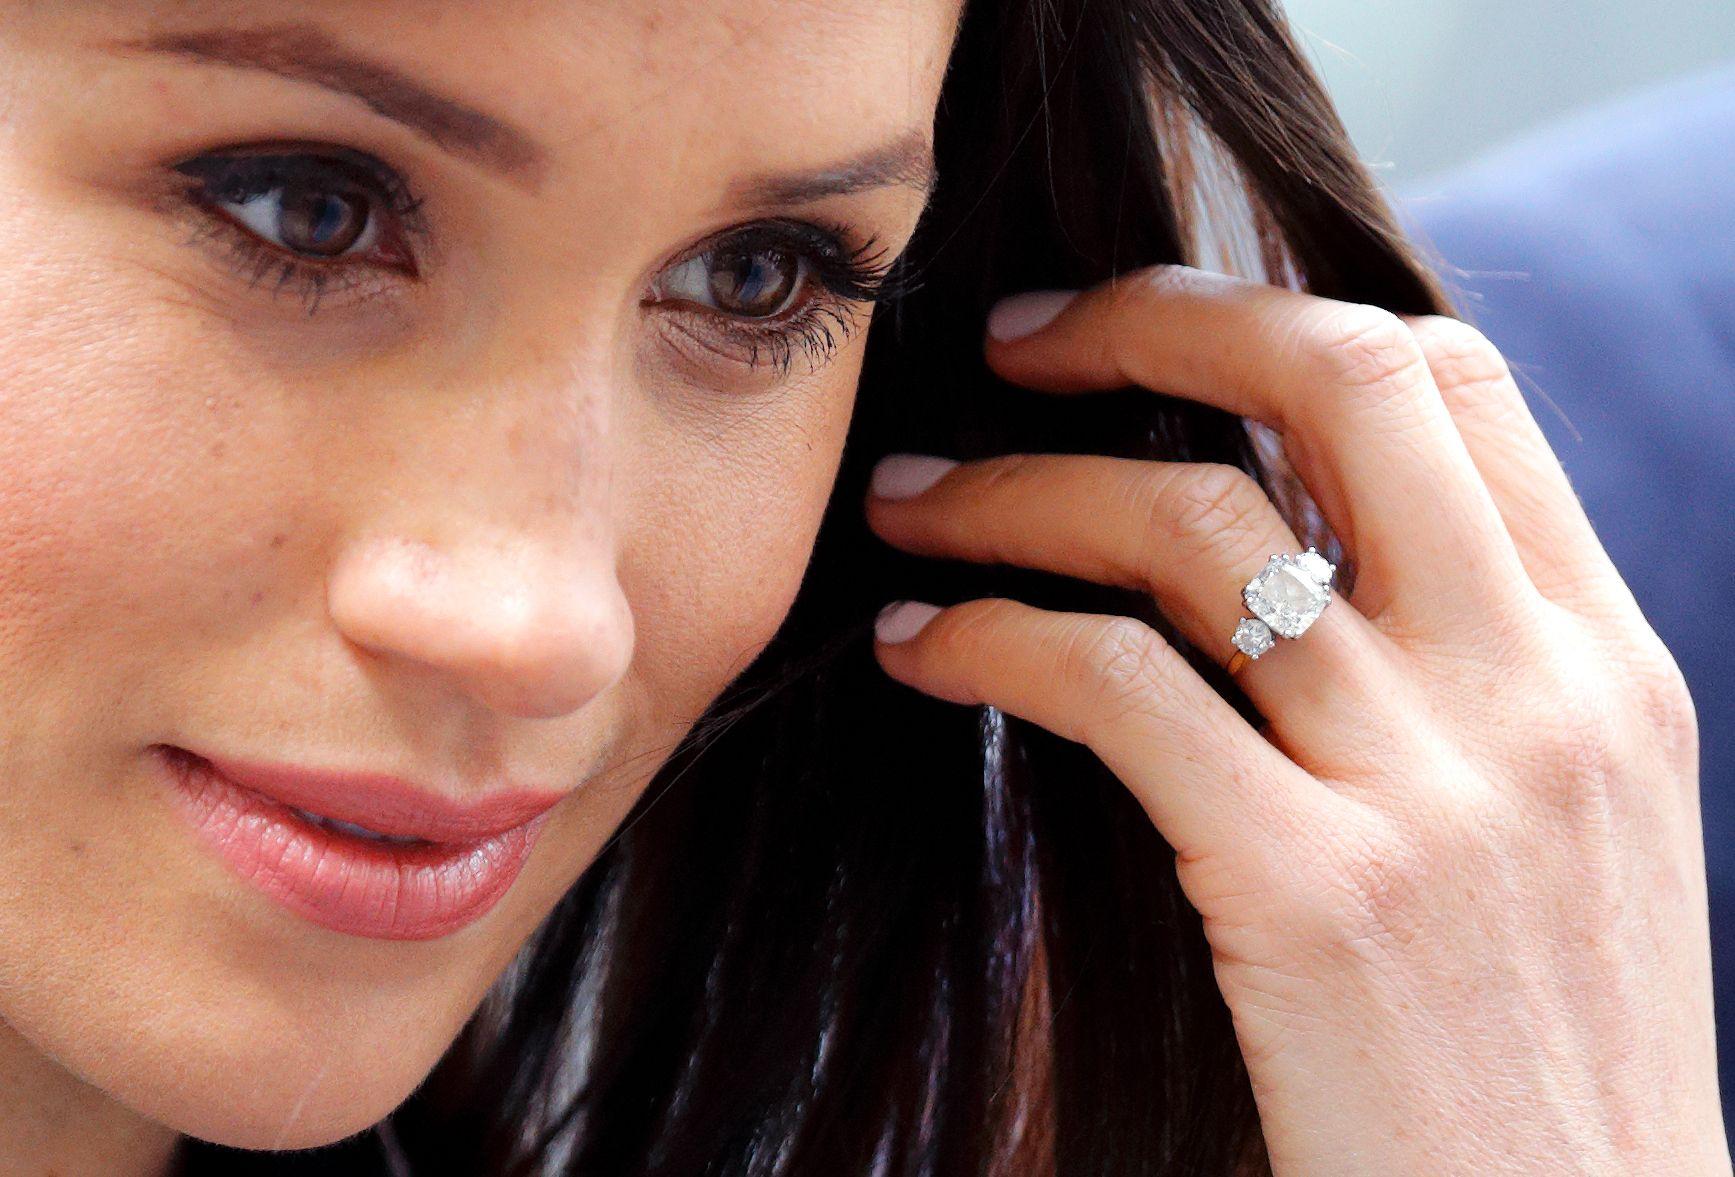 The Nail Polish Meghan Markle Wore For The Royal Wedding